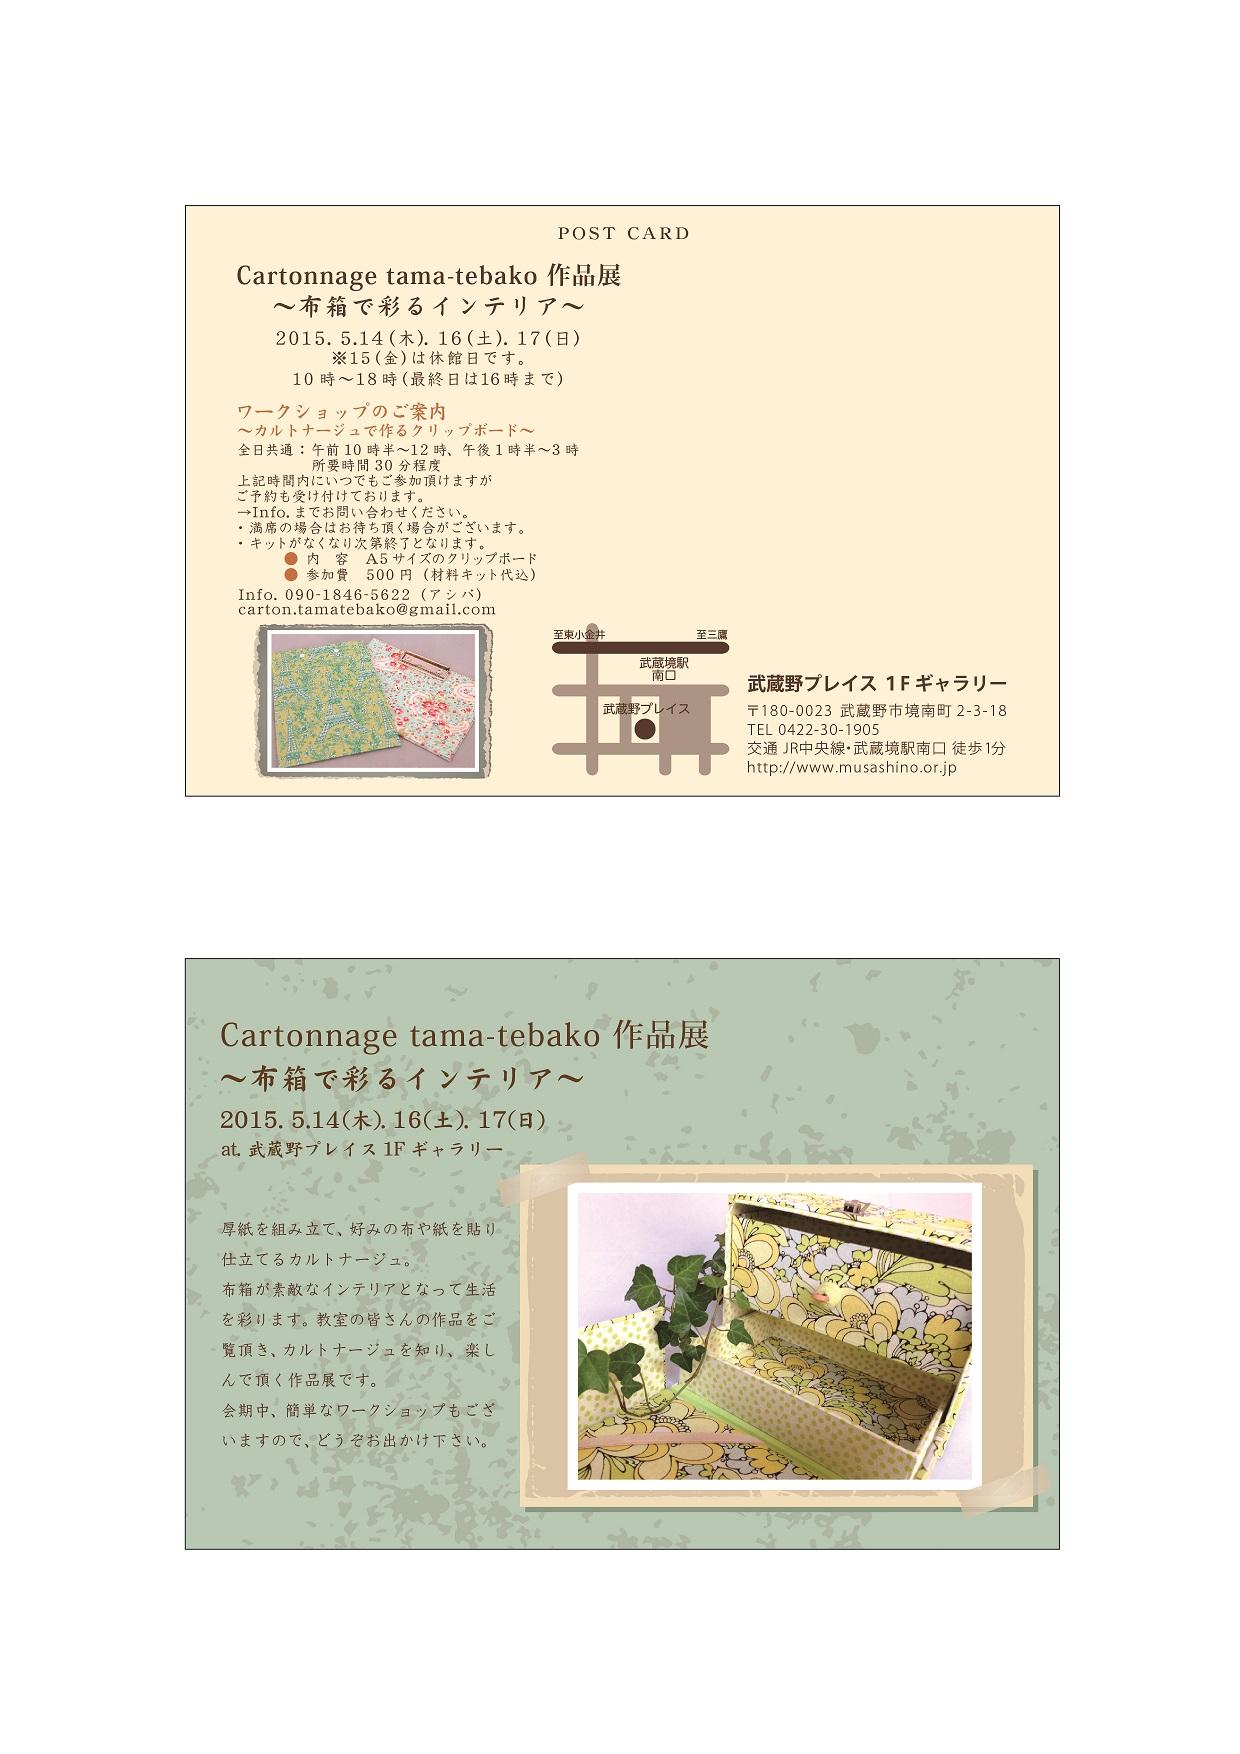 DM - コピー